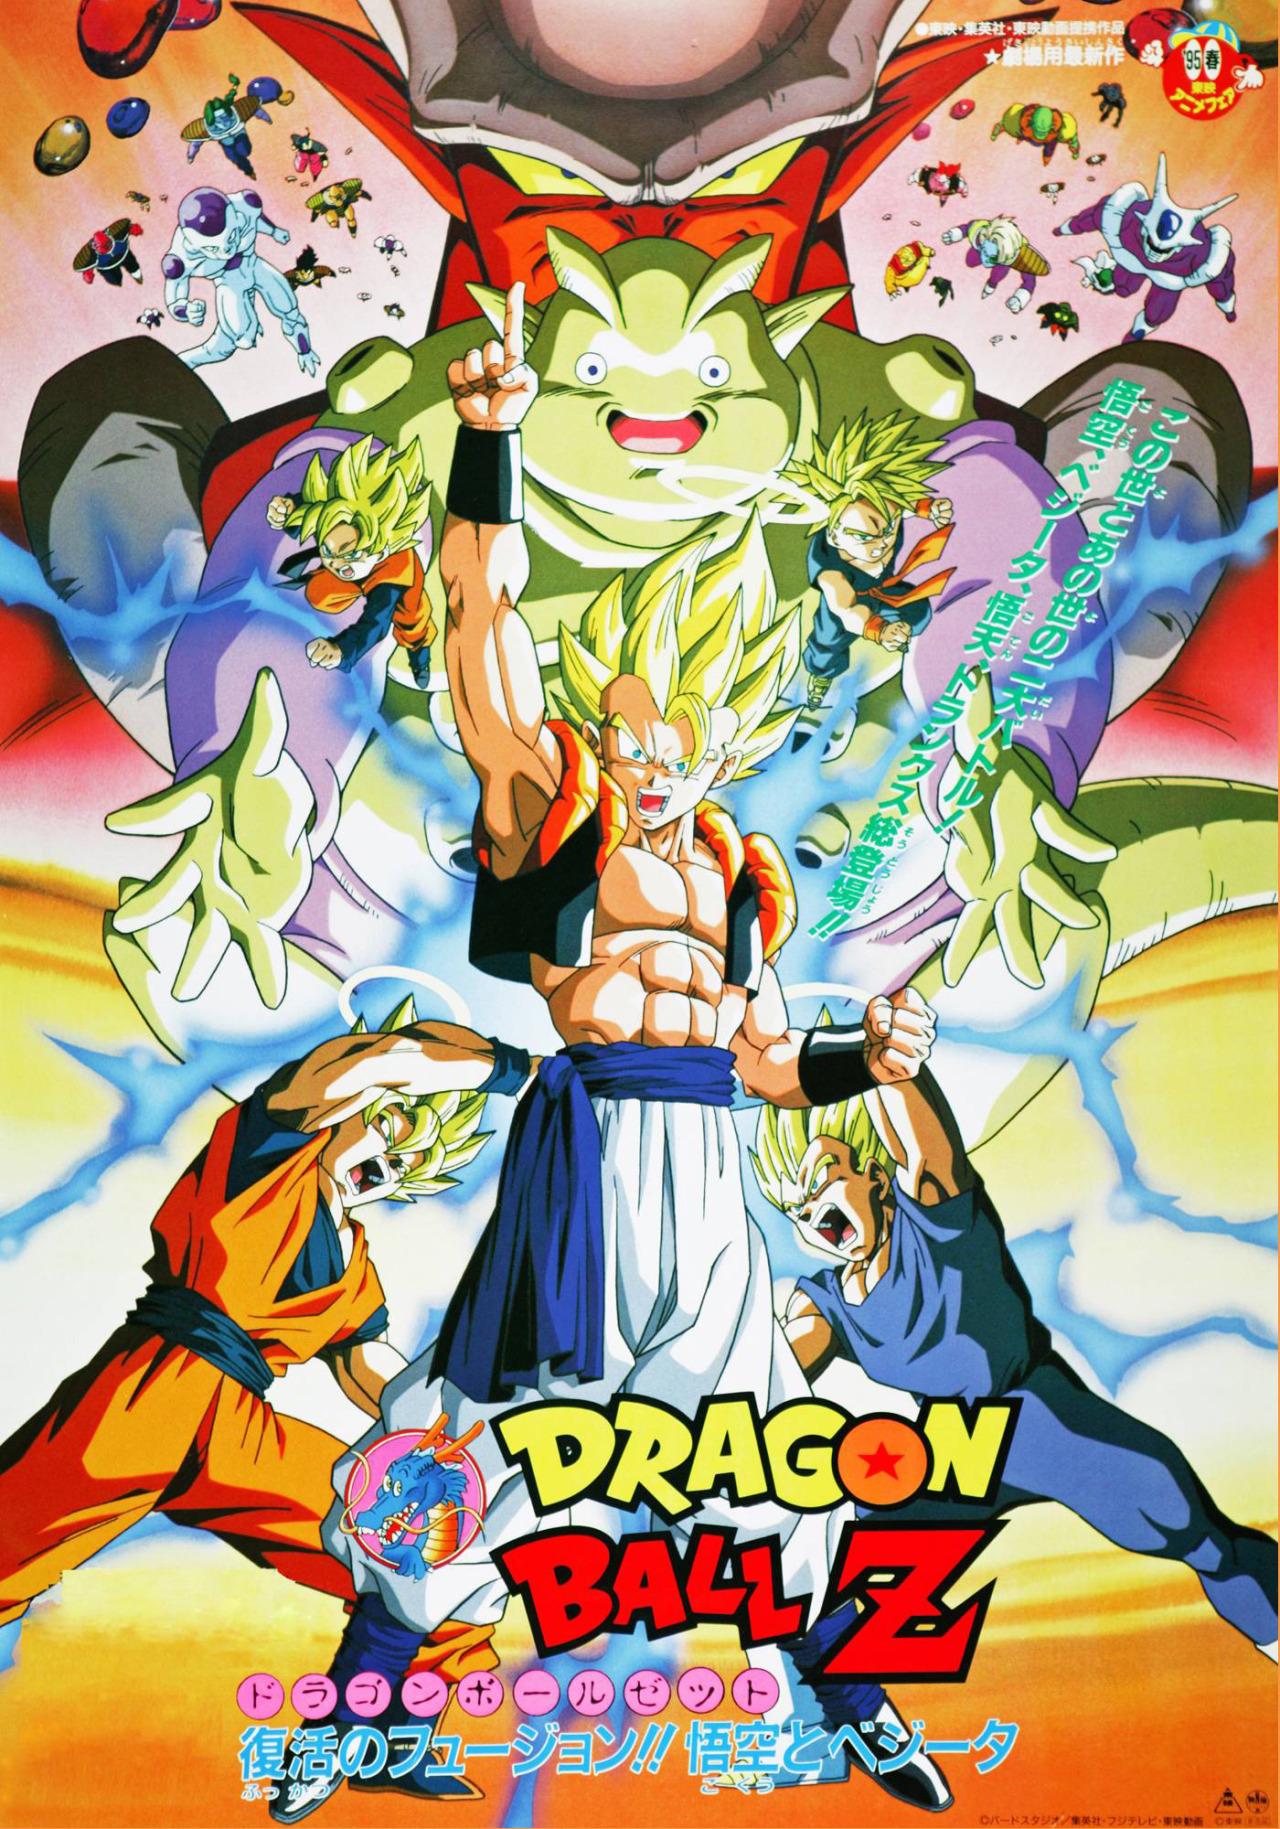 Dragon ball z anime online